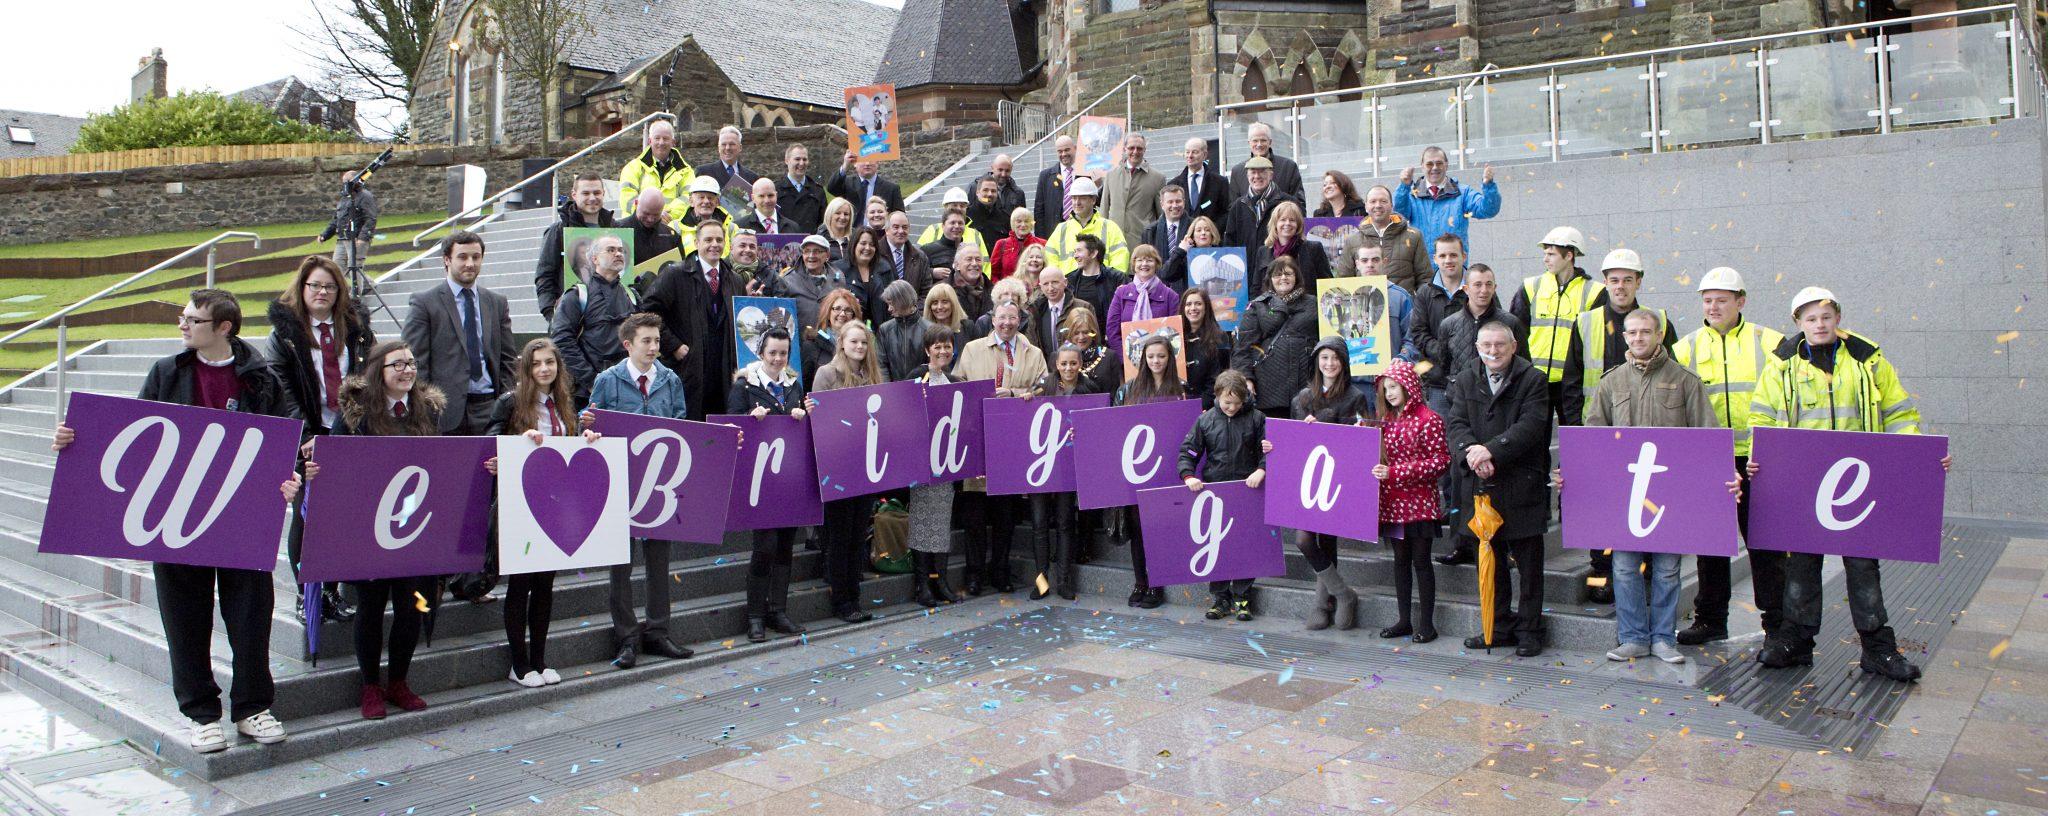 Bridgegate Public Realm